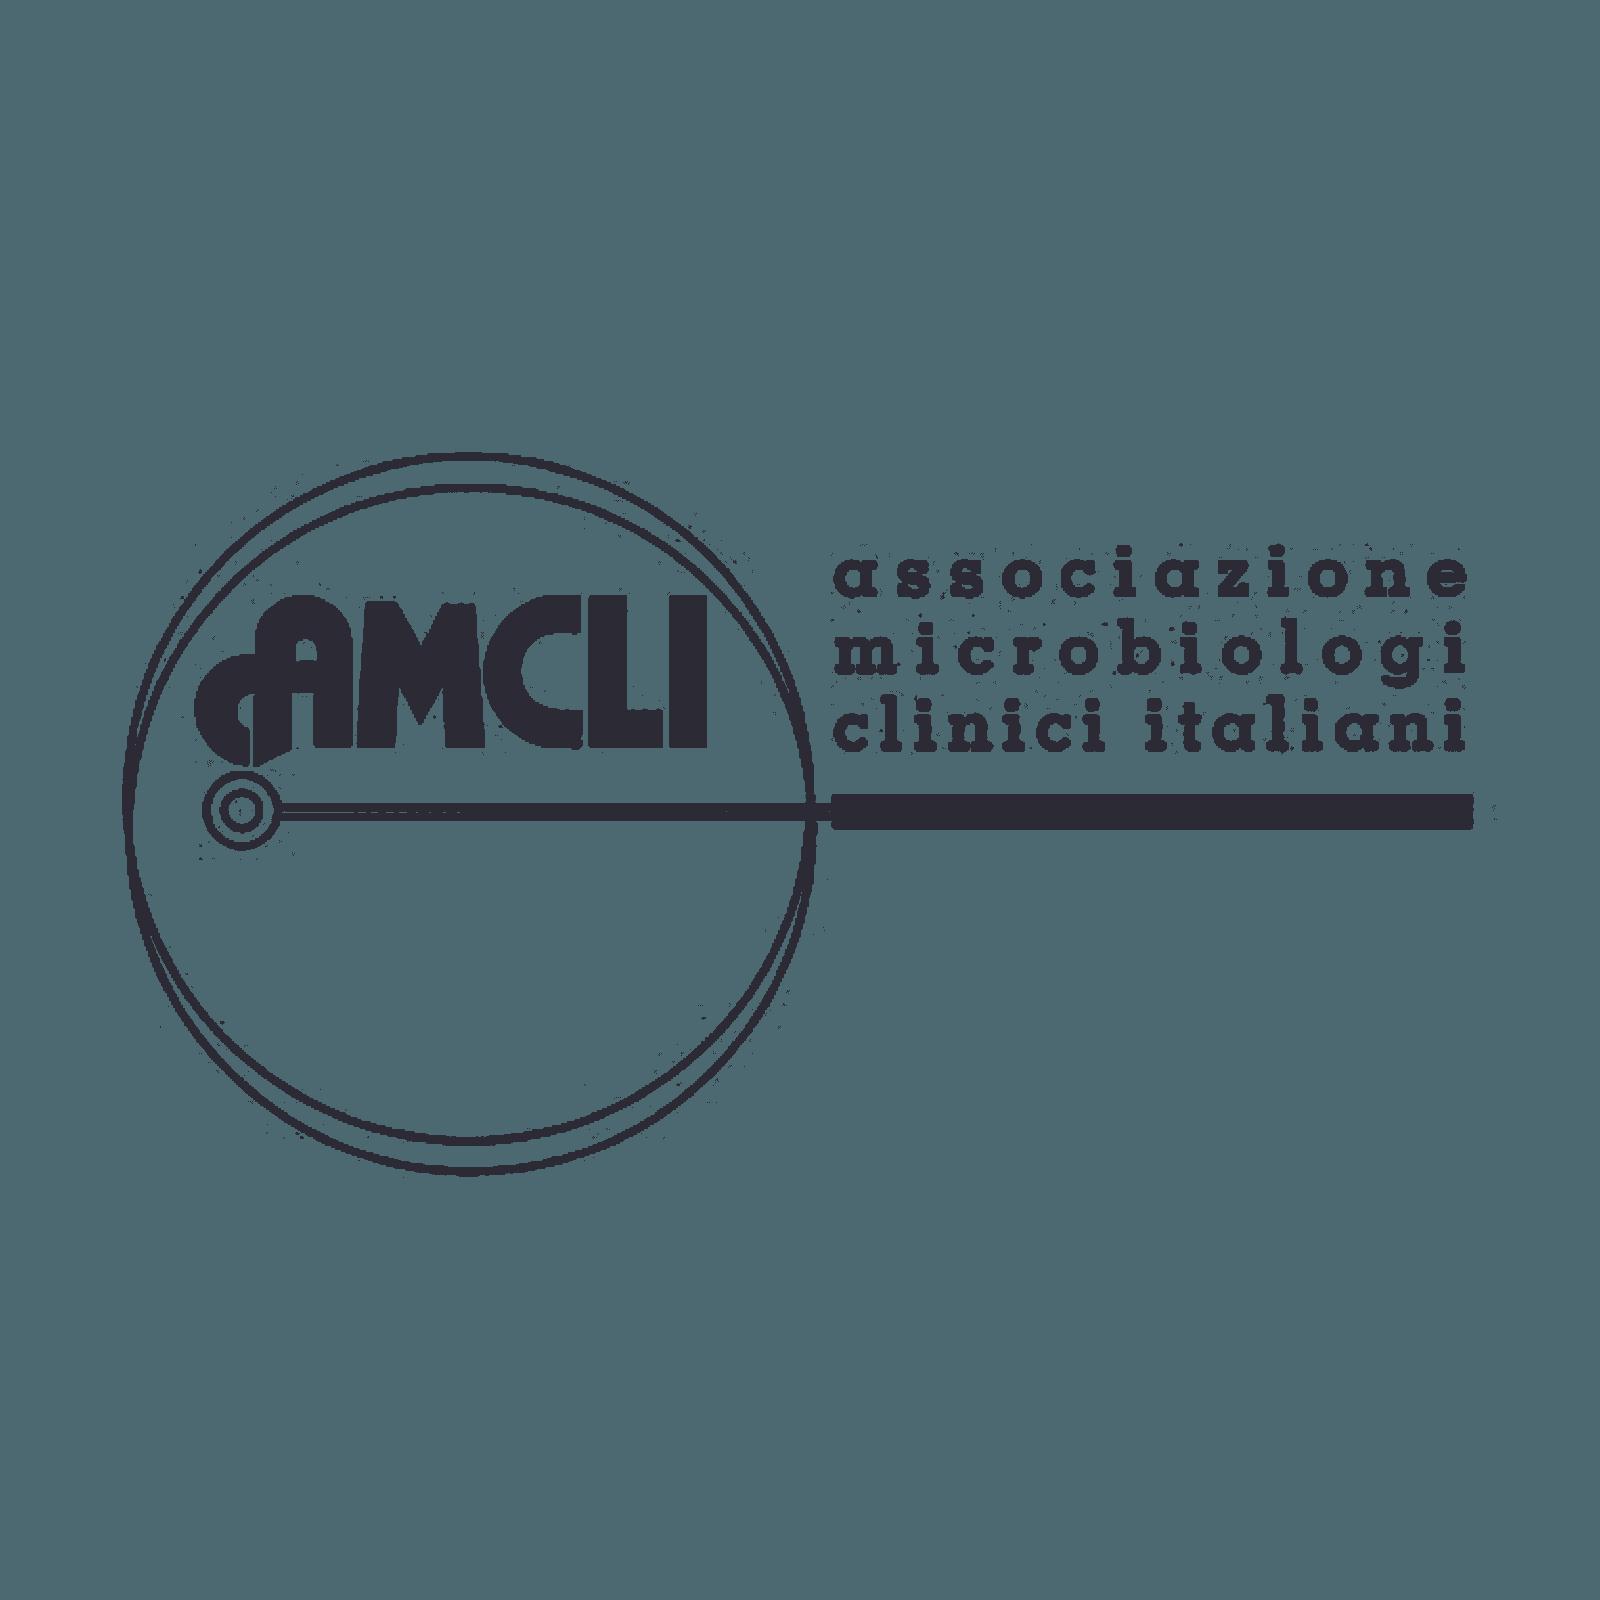 amcli brand